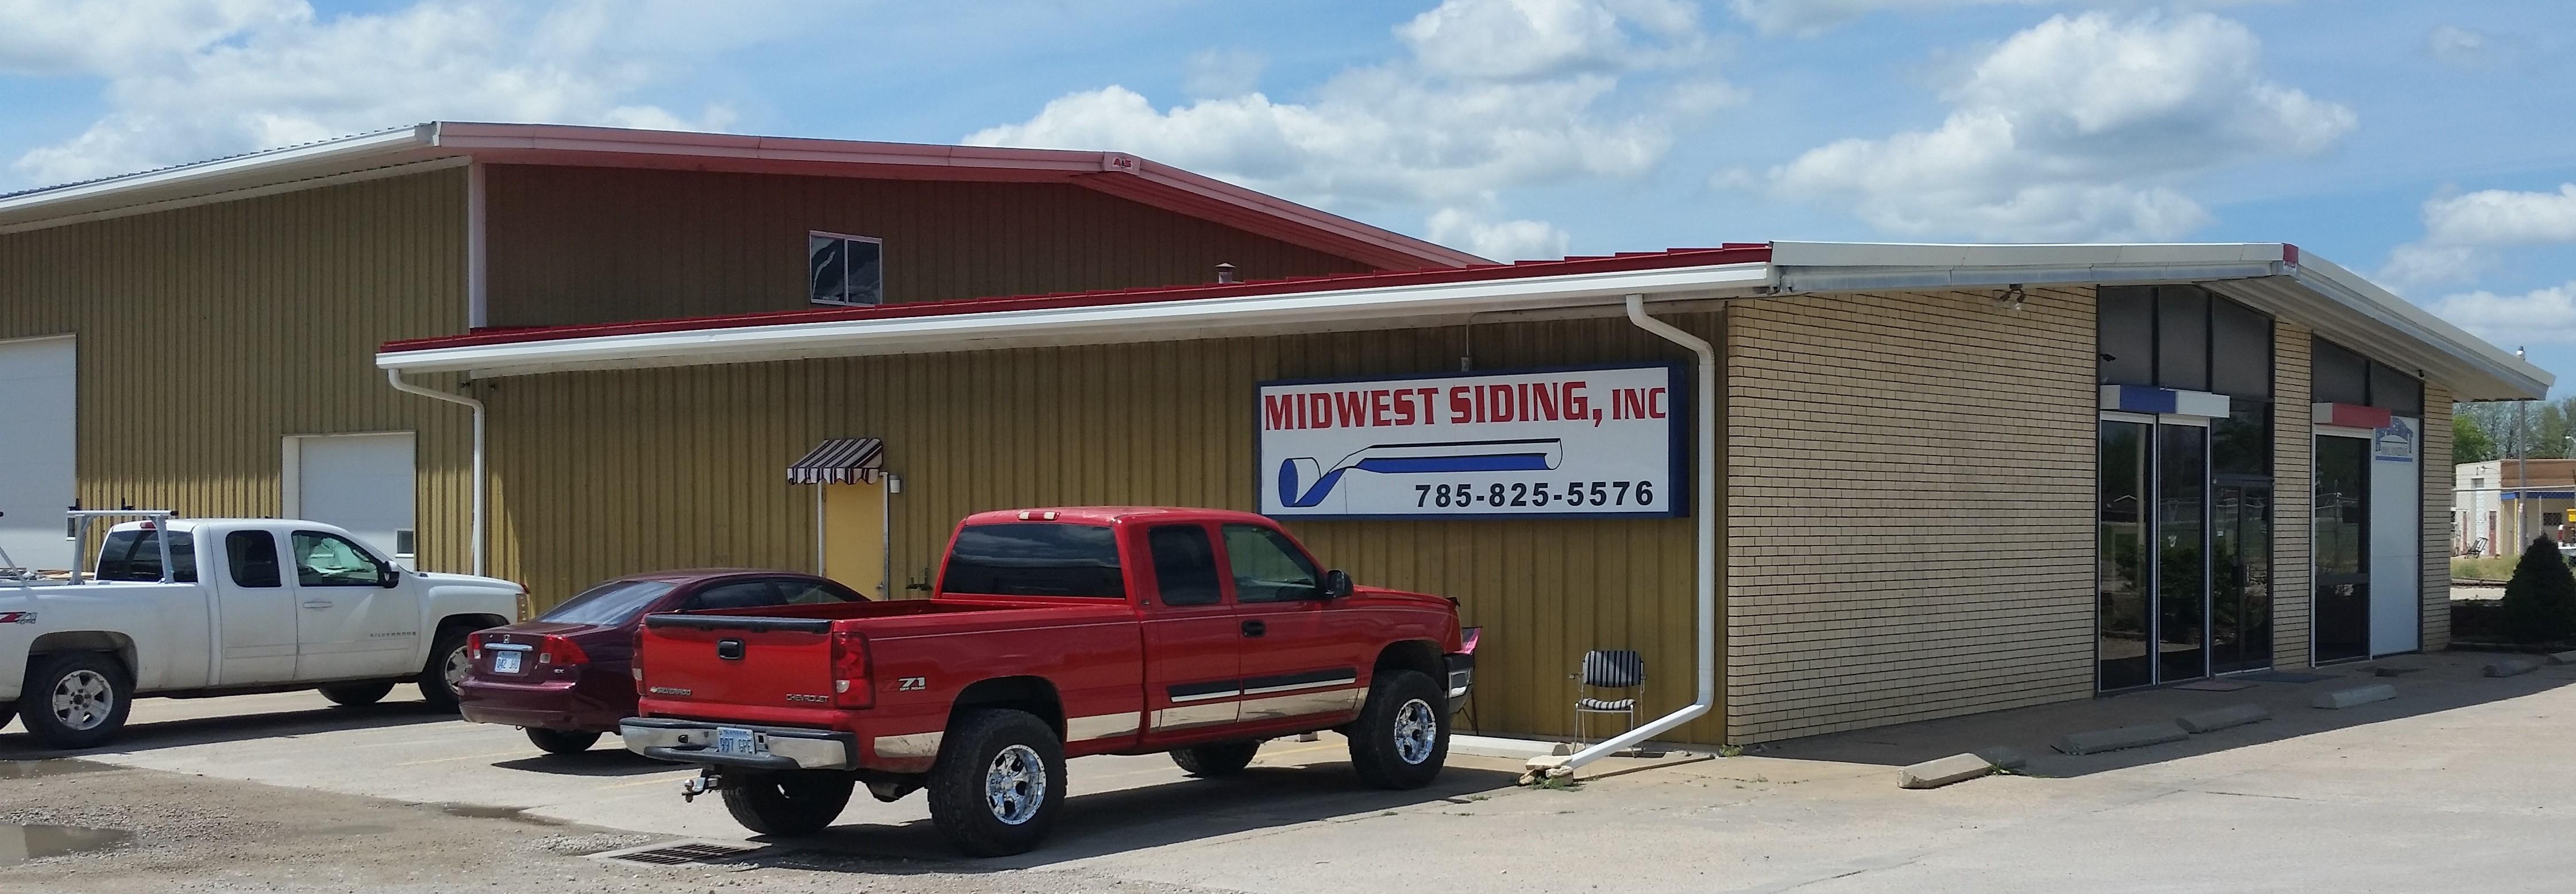 Midwest Siding Inc. image 0